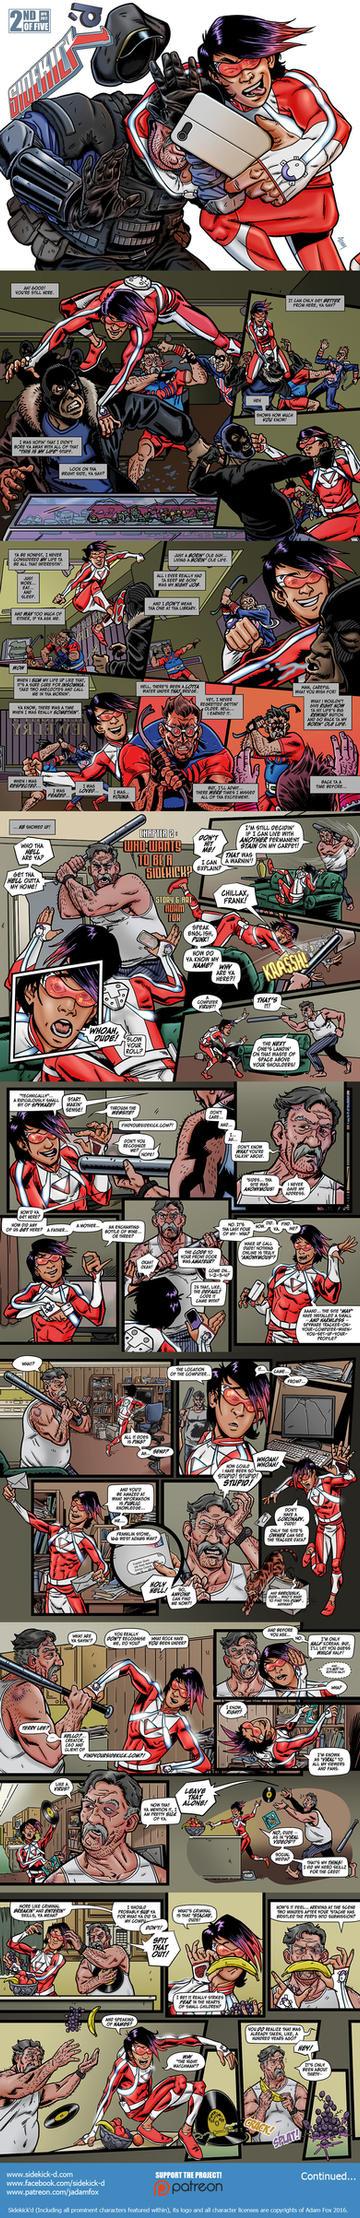 Sidekick'd #2 (Page 1 of 4) by jadamfox